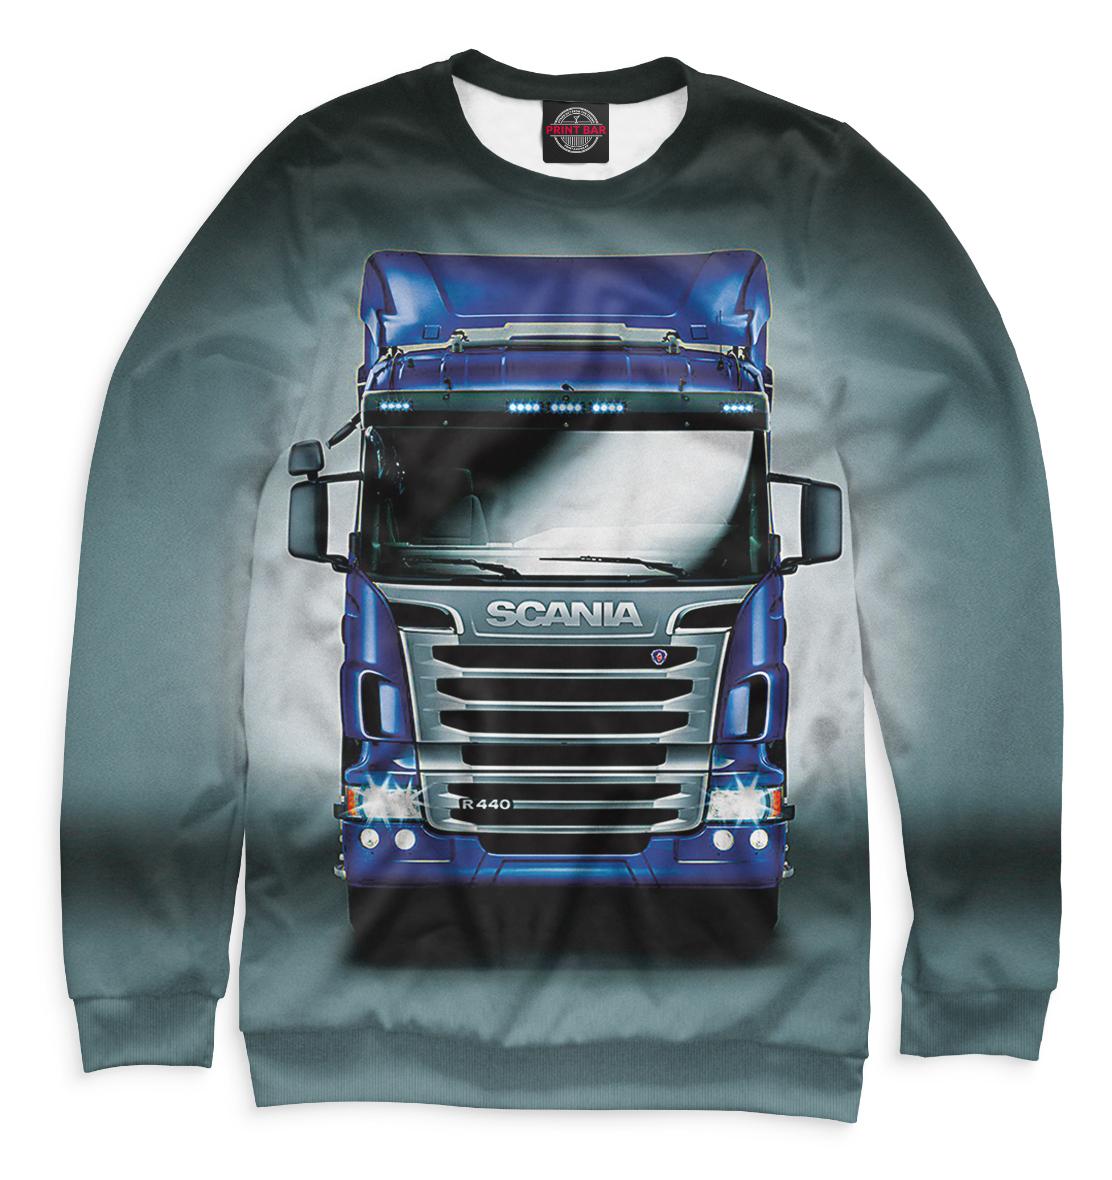 Купить Scania, Printbar, Свитшоты, GRZ-595161-swi-2